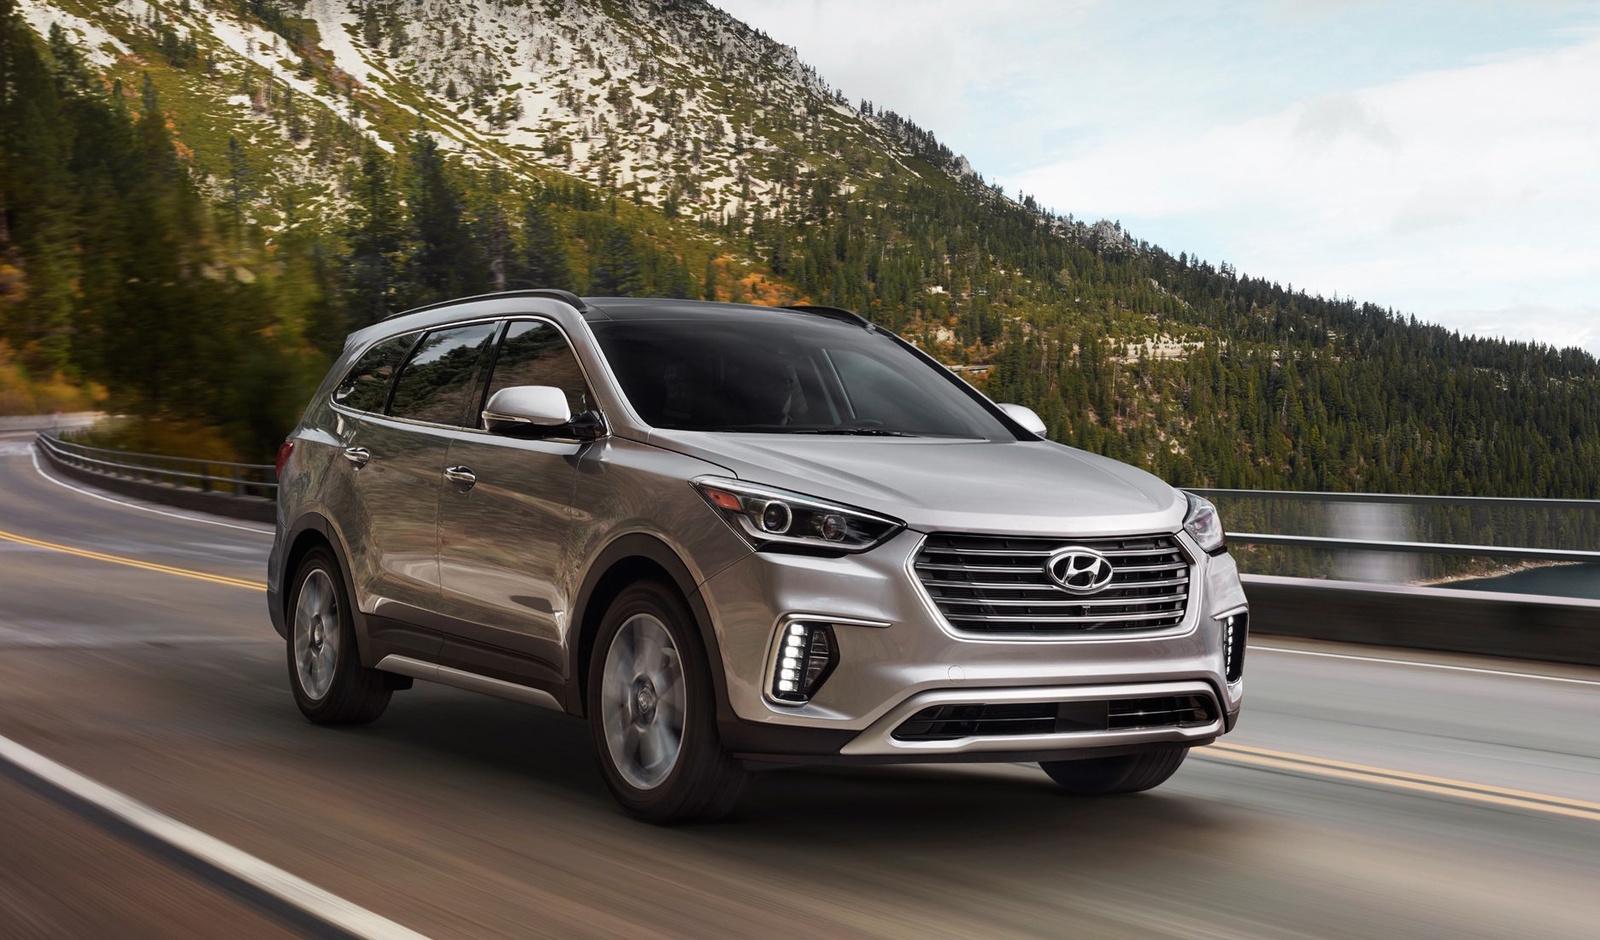 Hyundai Santa Fe получил высшую награду экспертов IIHS 1